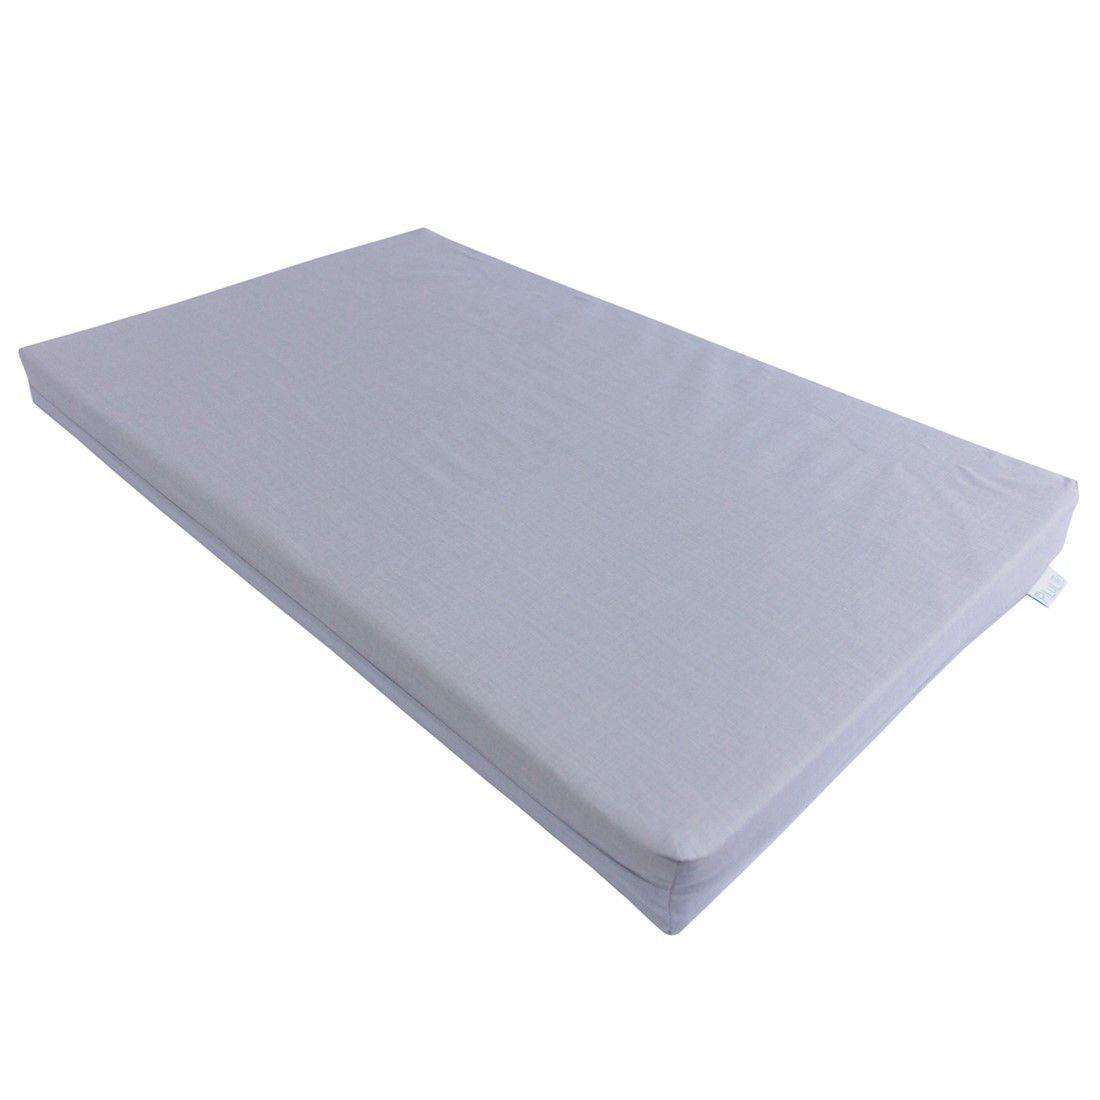 Trocador convencional cinza névoa